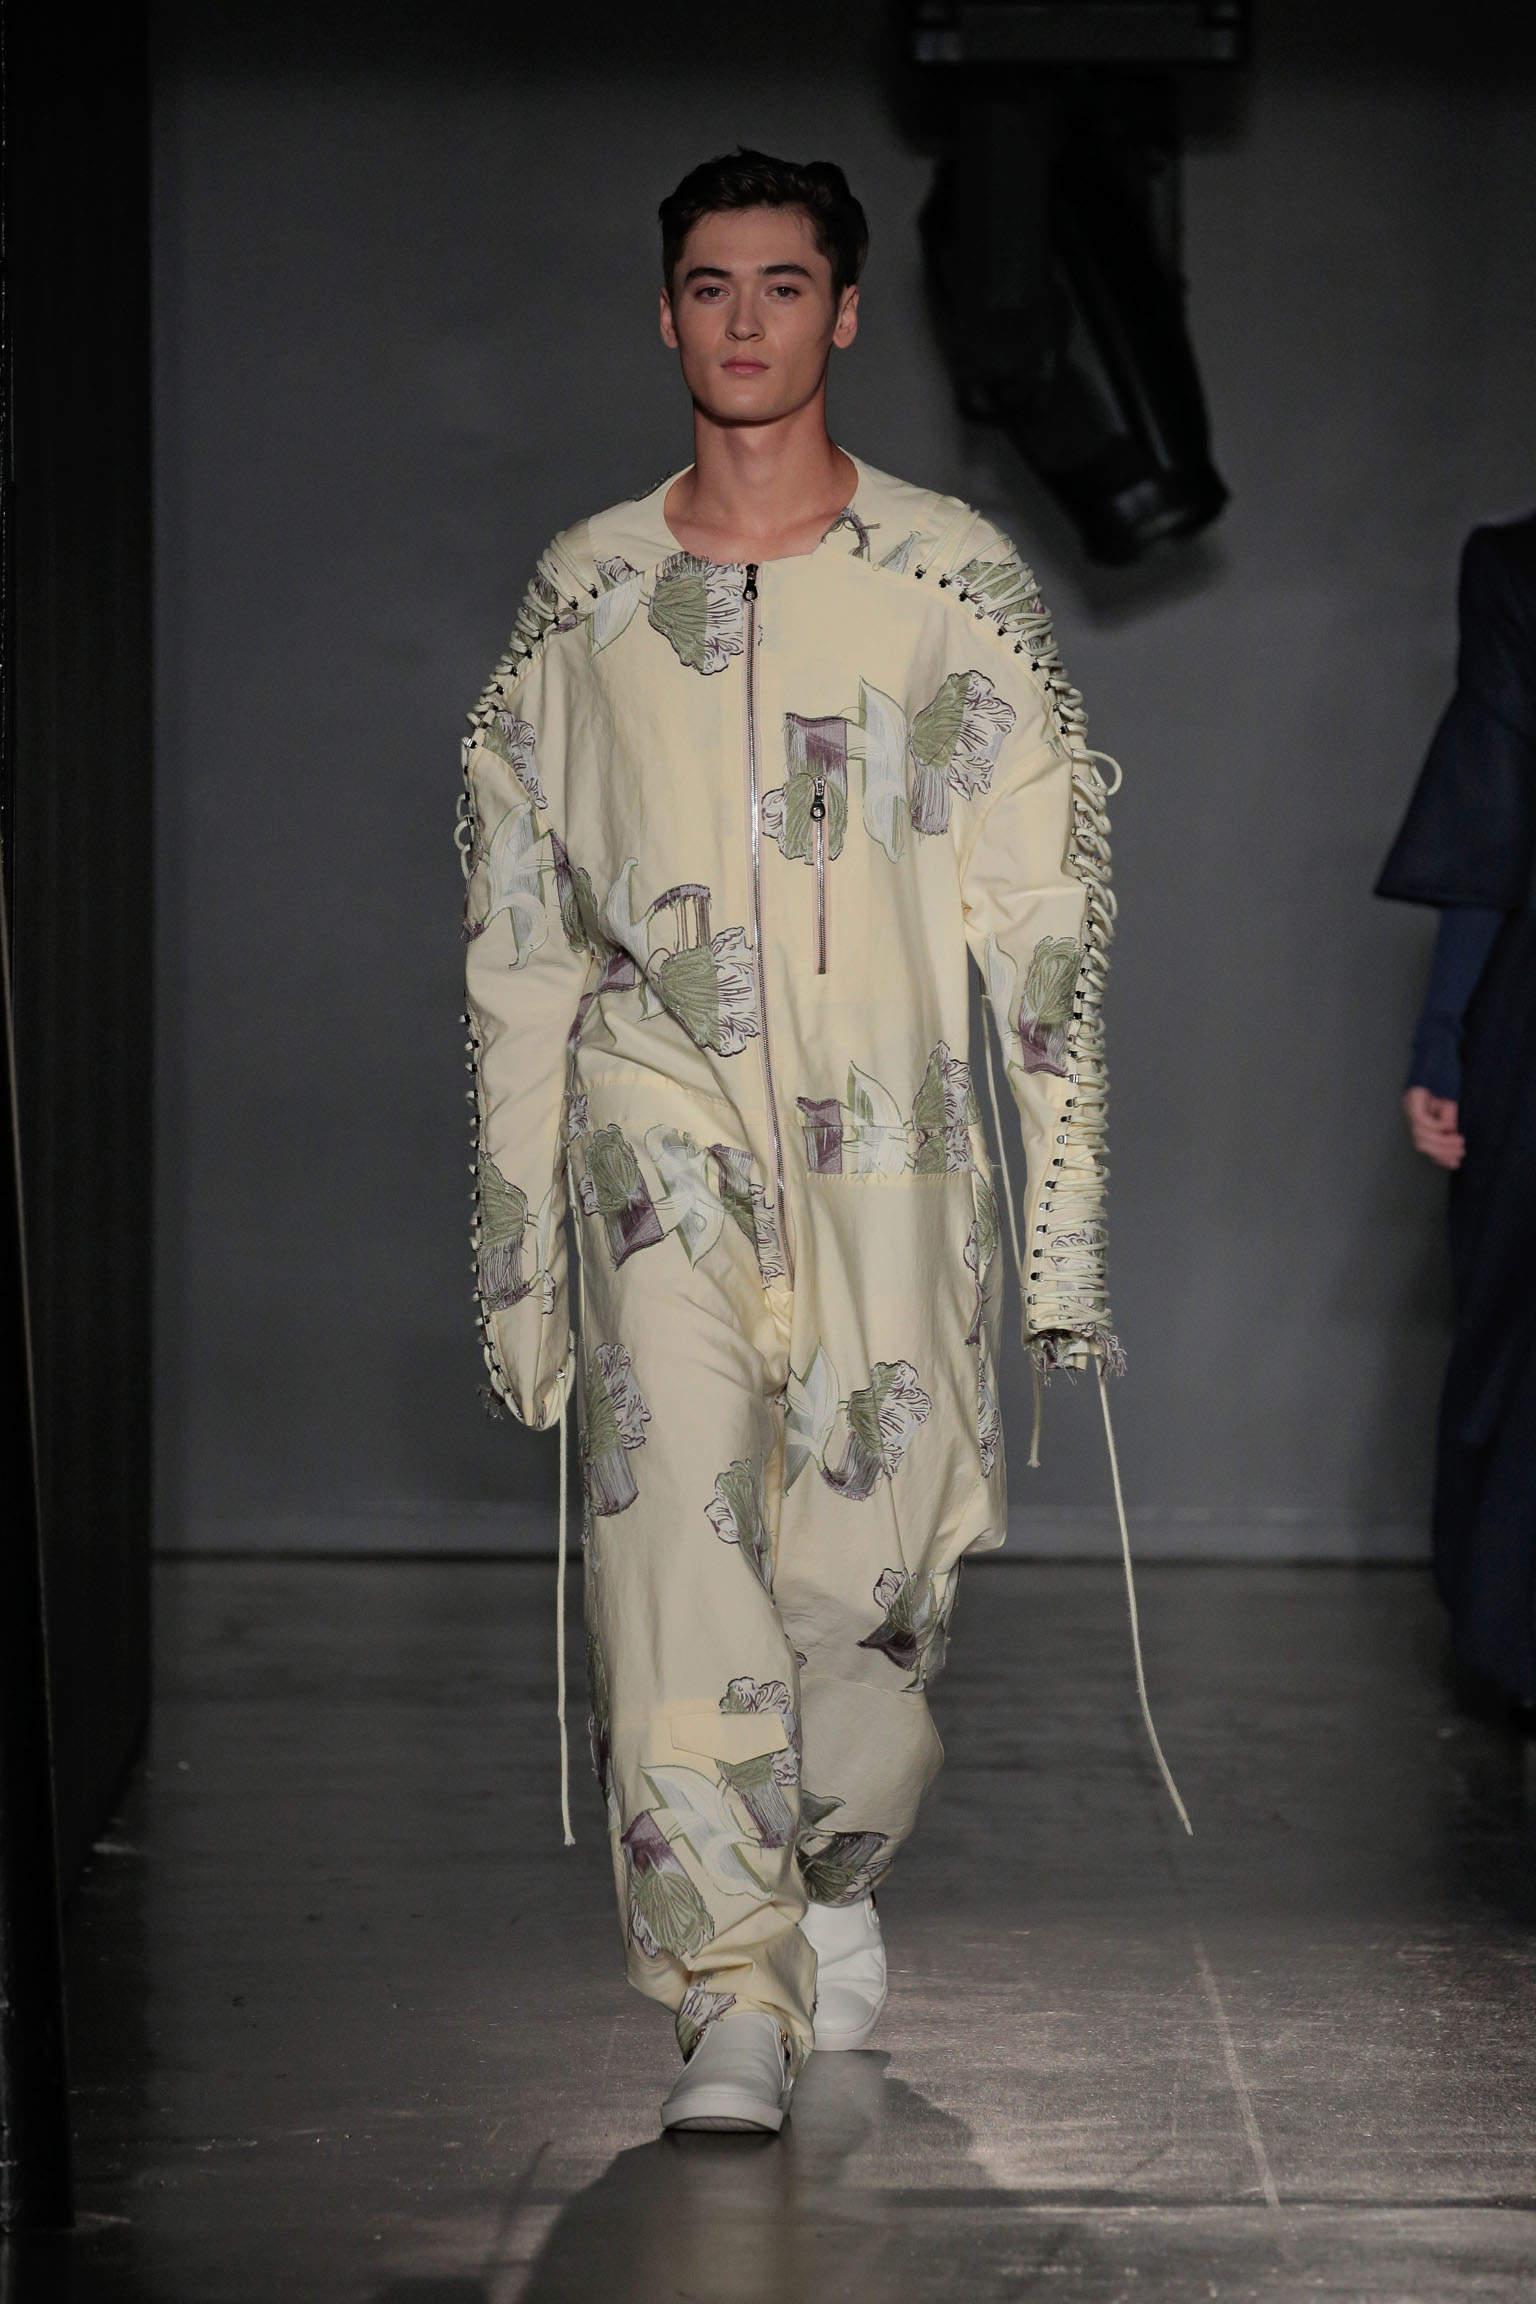 San Francisco 39 S Hottest Fashion Design Talents Platea